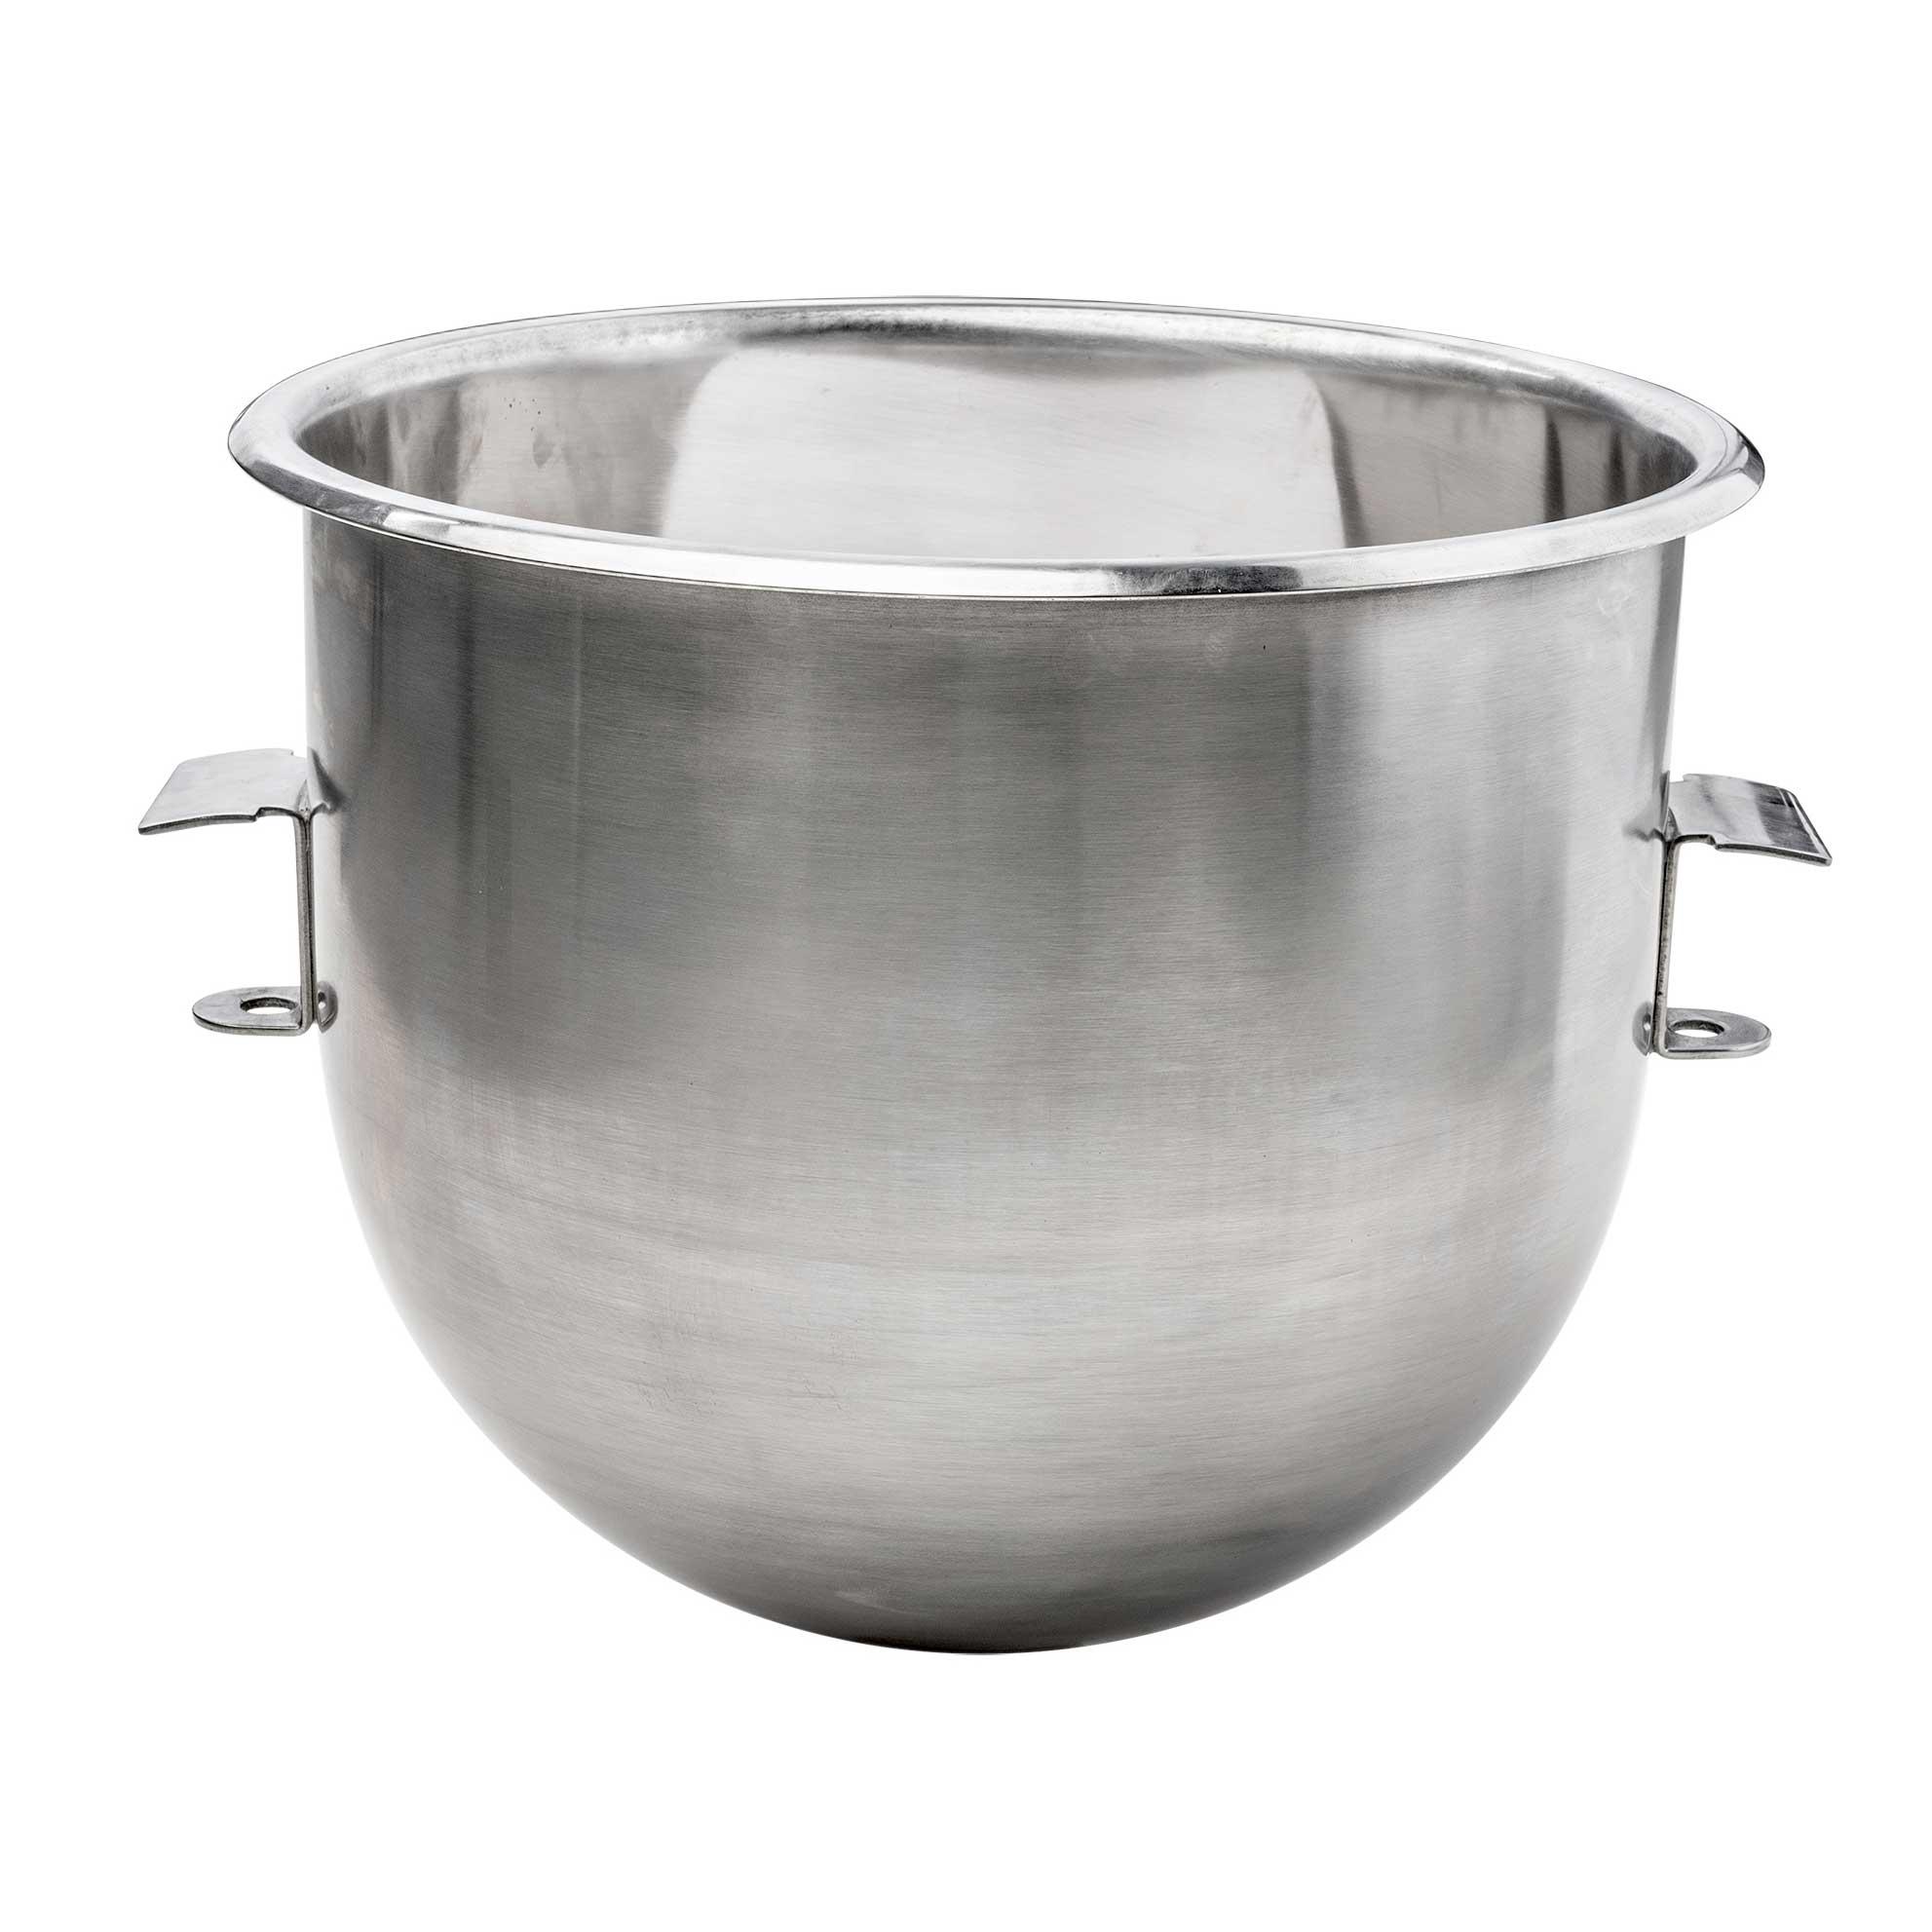 Hobart BOWL - HMM20 mixer bowl